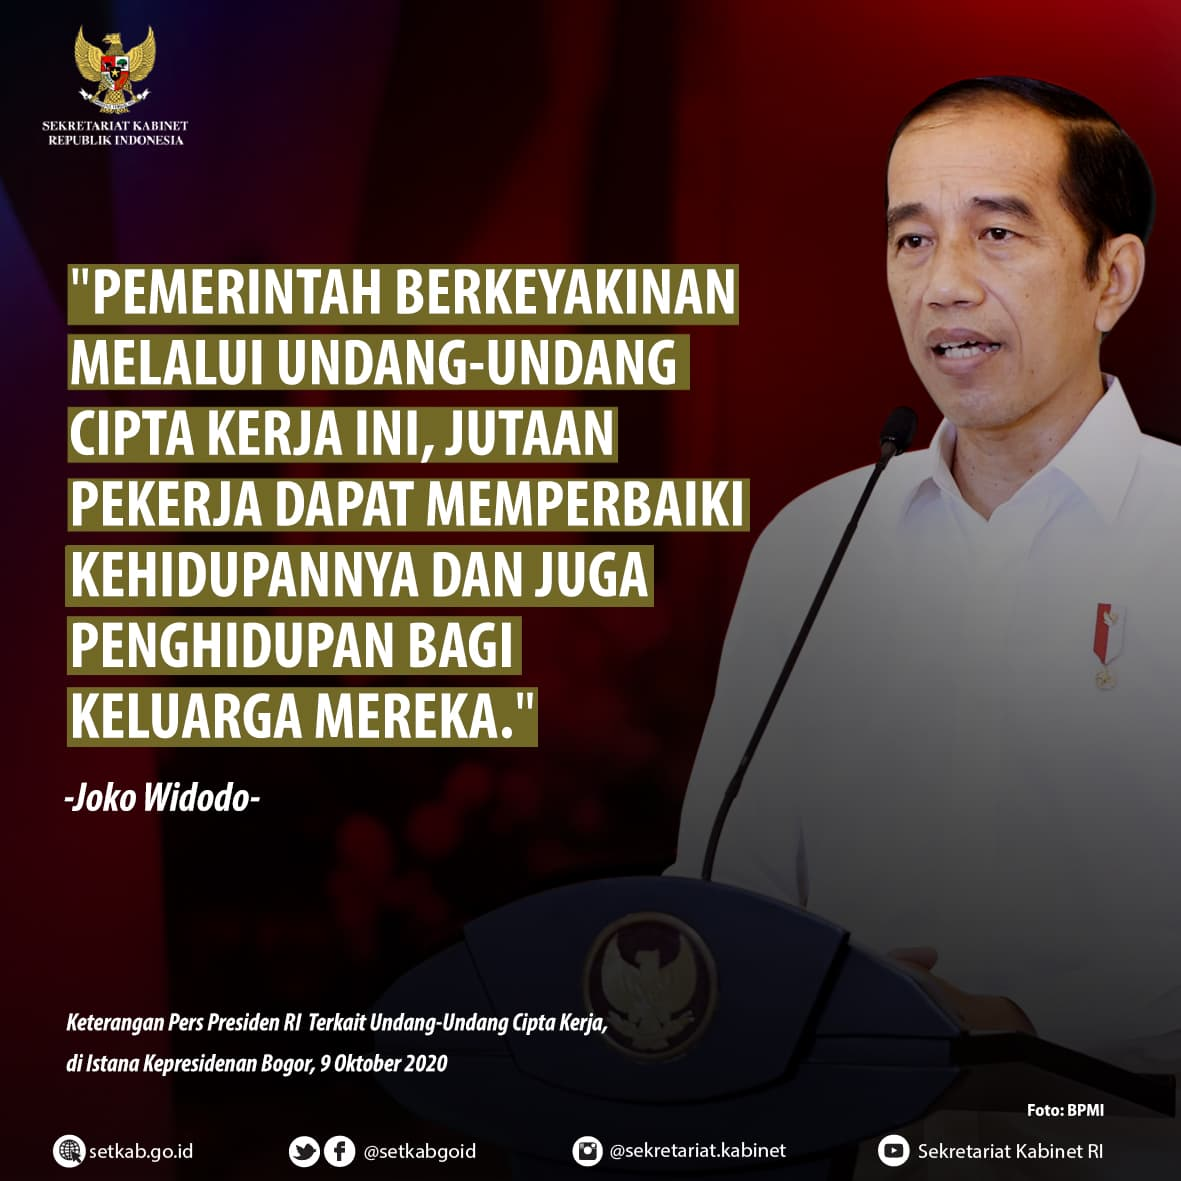 Pernyataan Presiden Joko Widodo terkait UU Cipta Kerja di Istana Kepresidenan Bogor, Jumat (9/10)